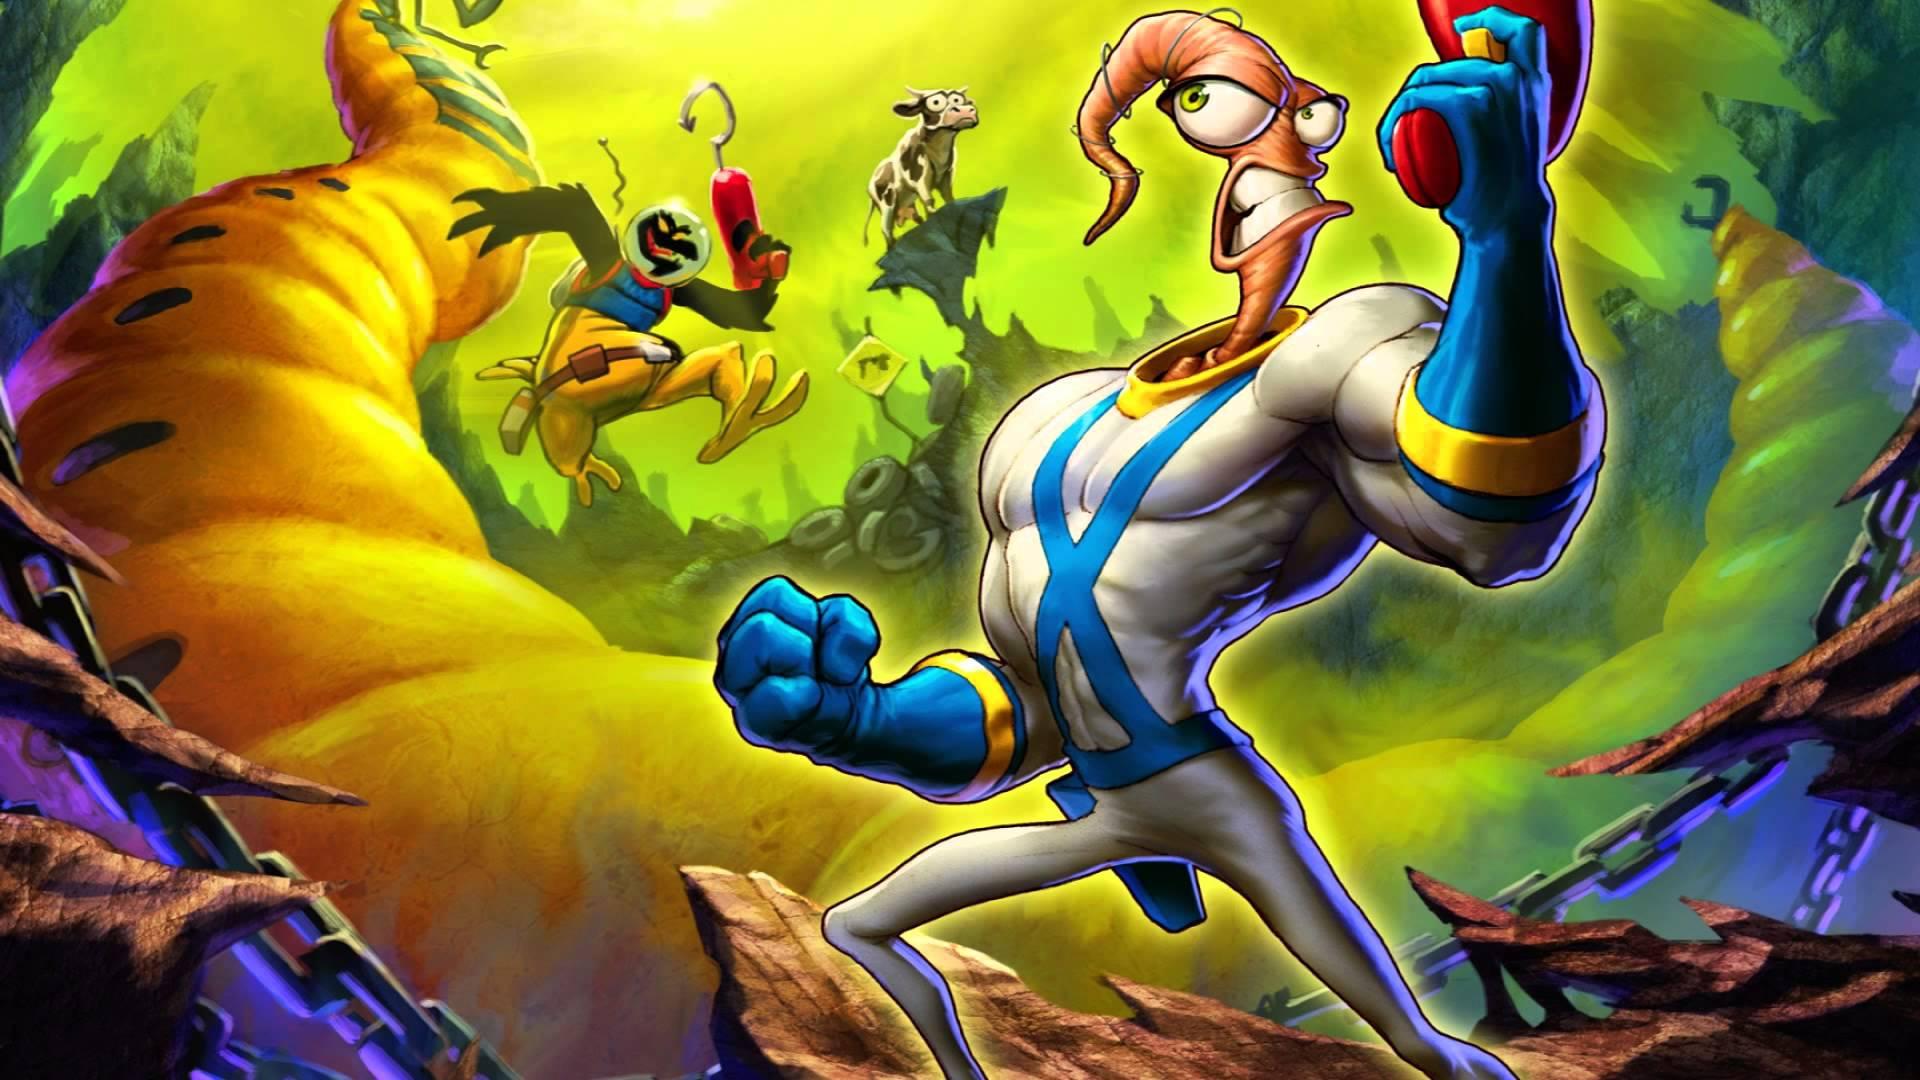 (Earthworm Jim, Playmates Interactive/Virgin Interactive)